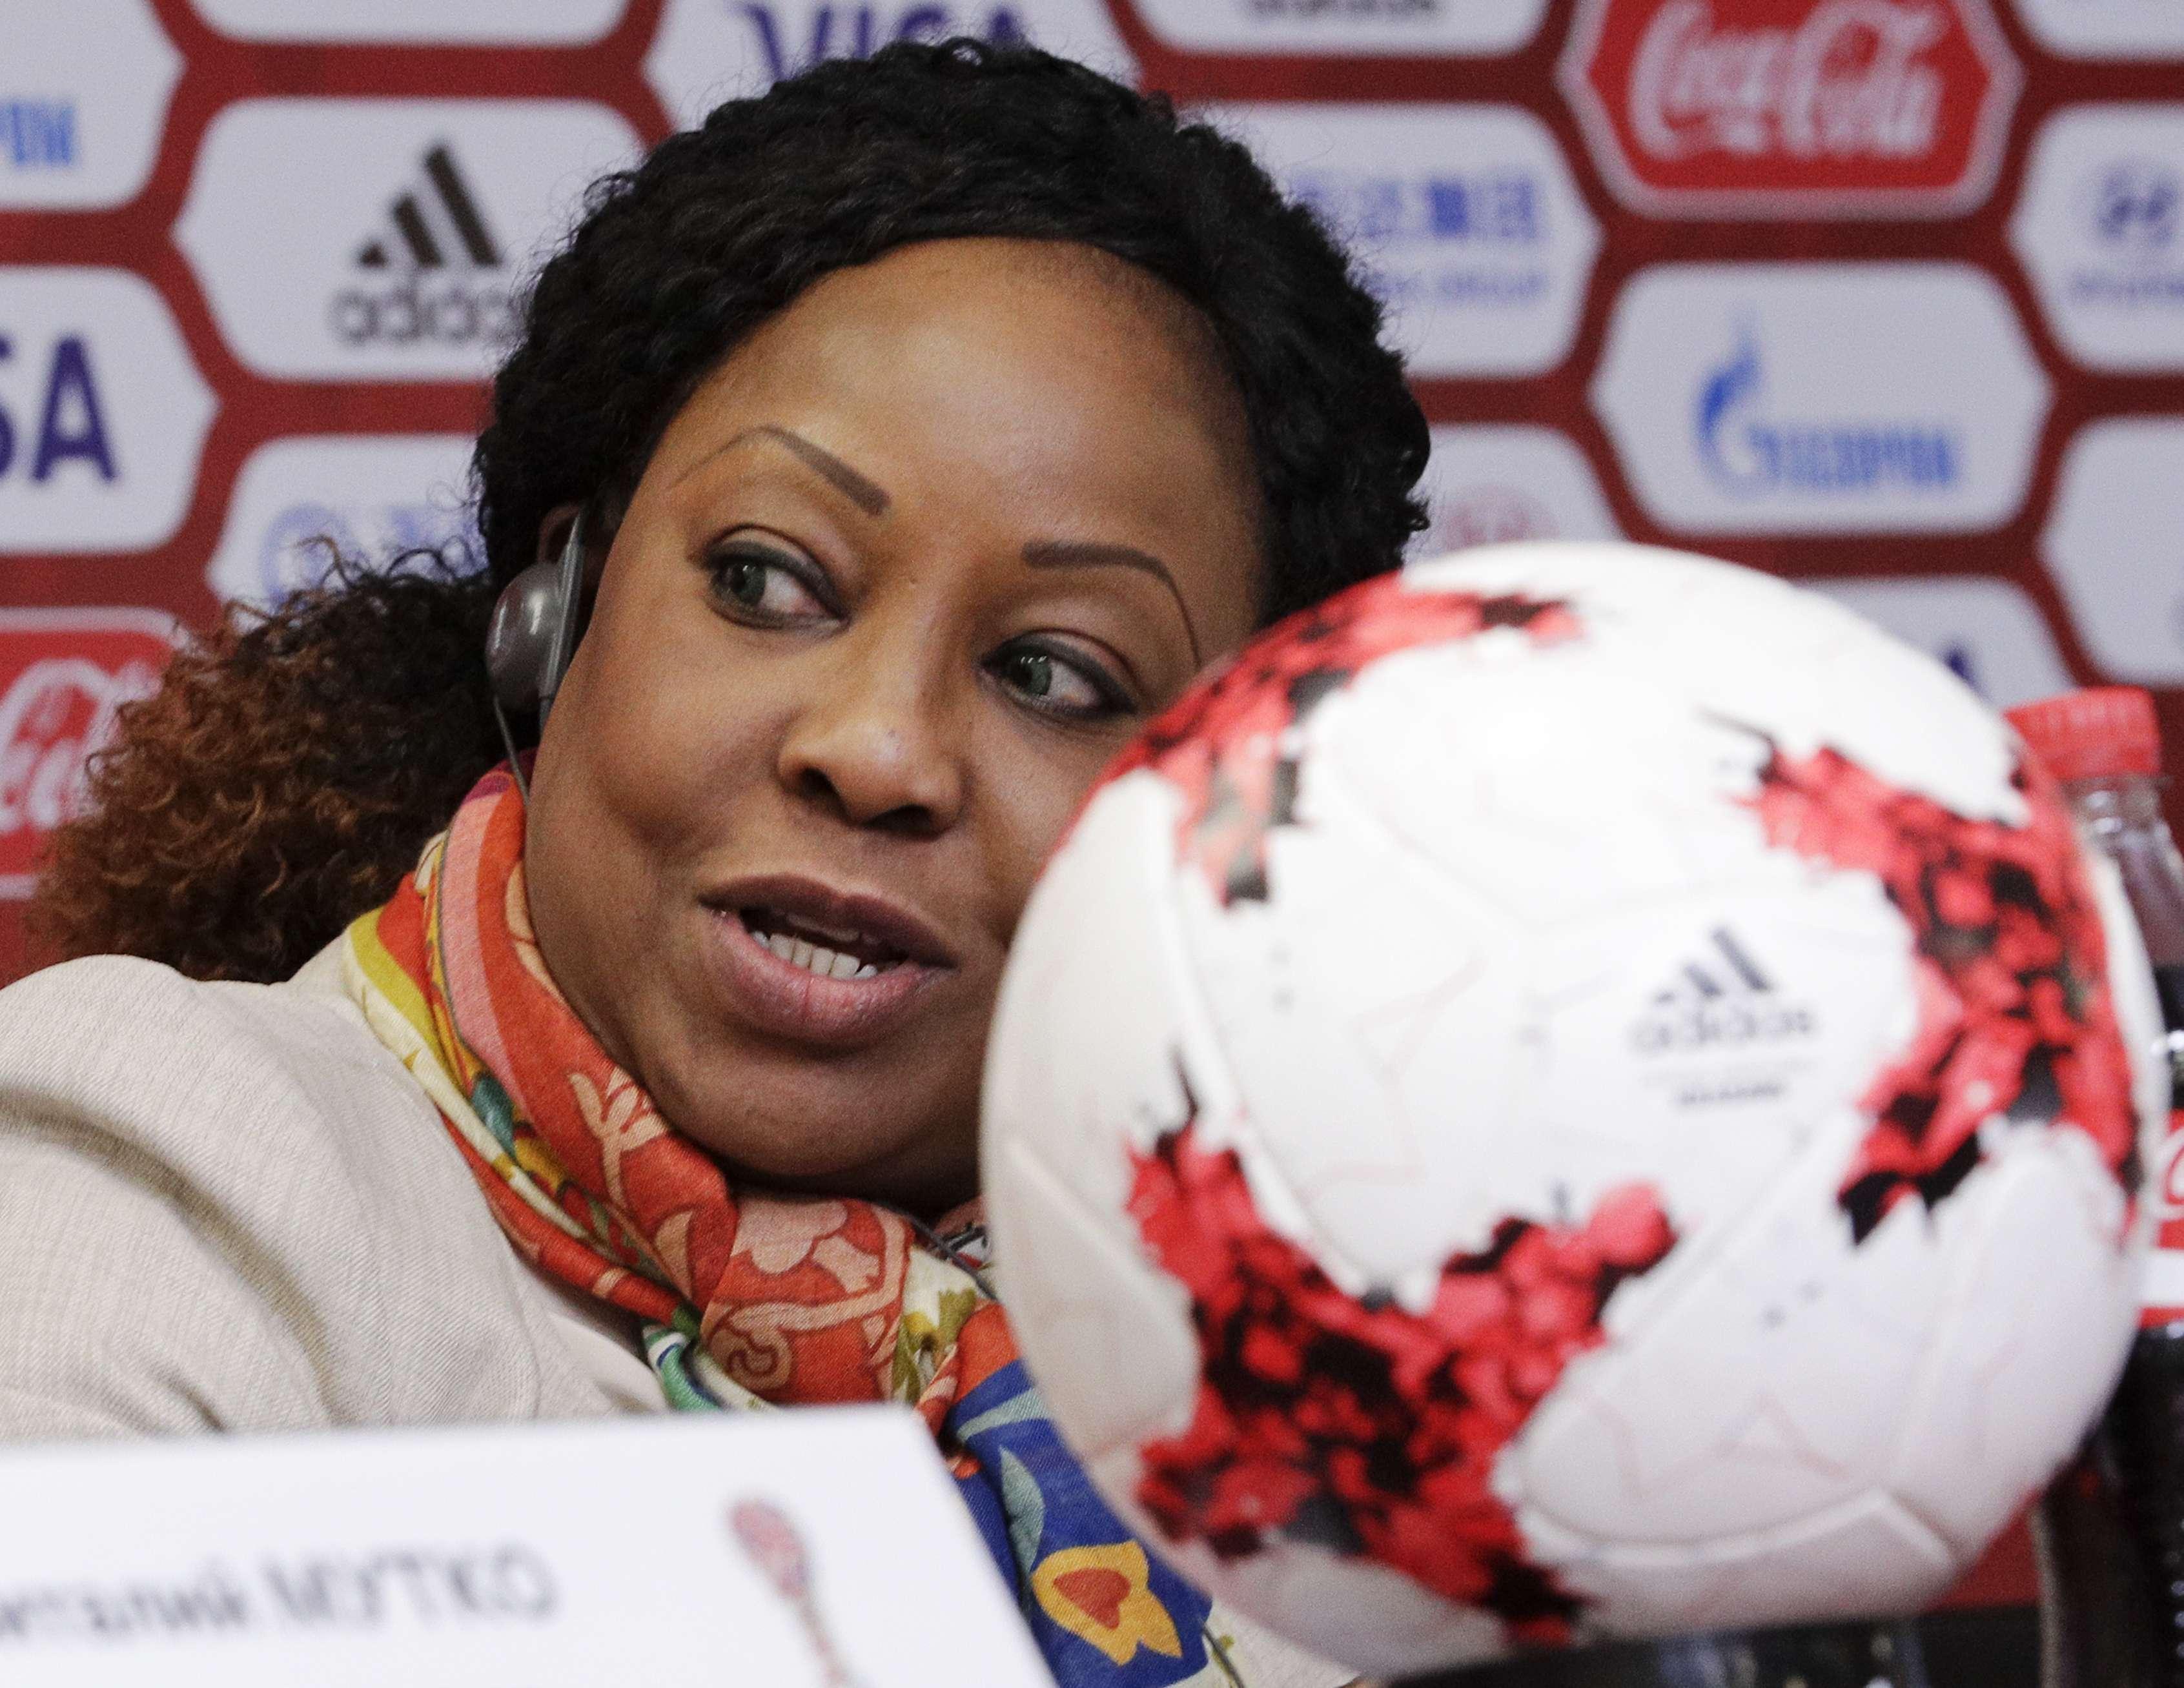 La secrétaire générale de la Fifa, Fatma Samoura, lors d'une conférence de presse, le mardi 25 avril 2017.